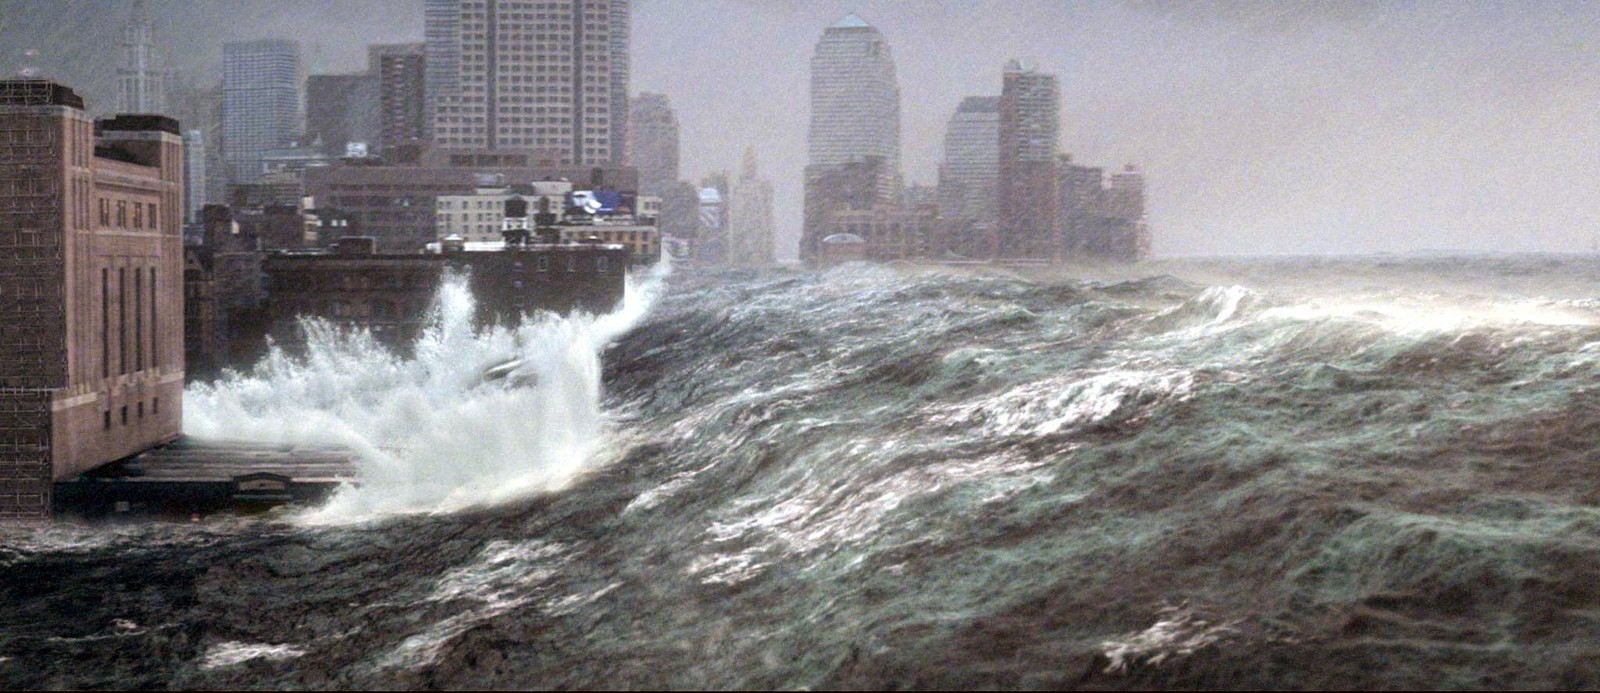 Tsunami à New York…Image tirée du film catastrophe